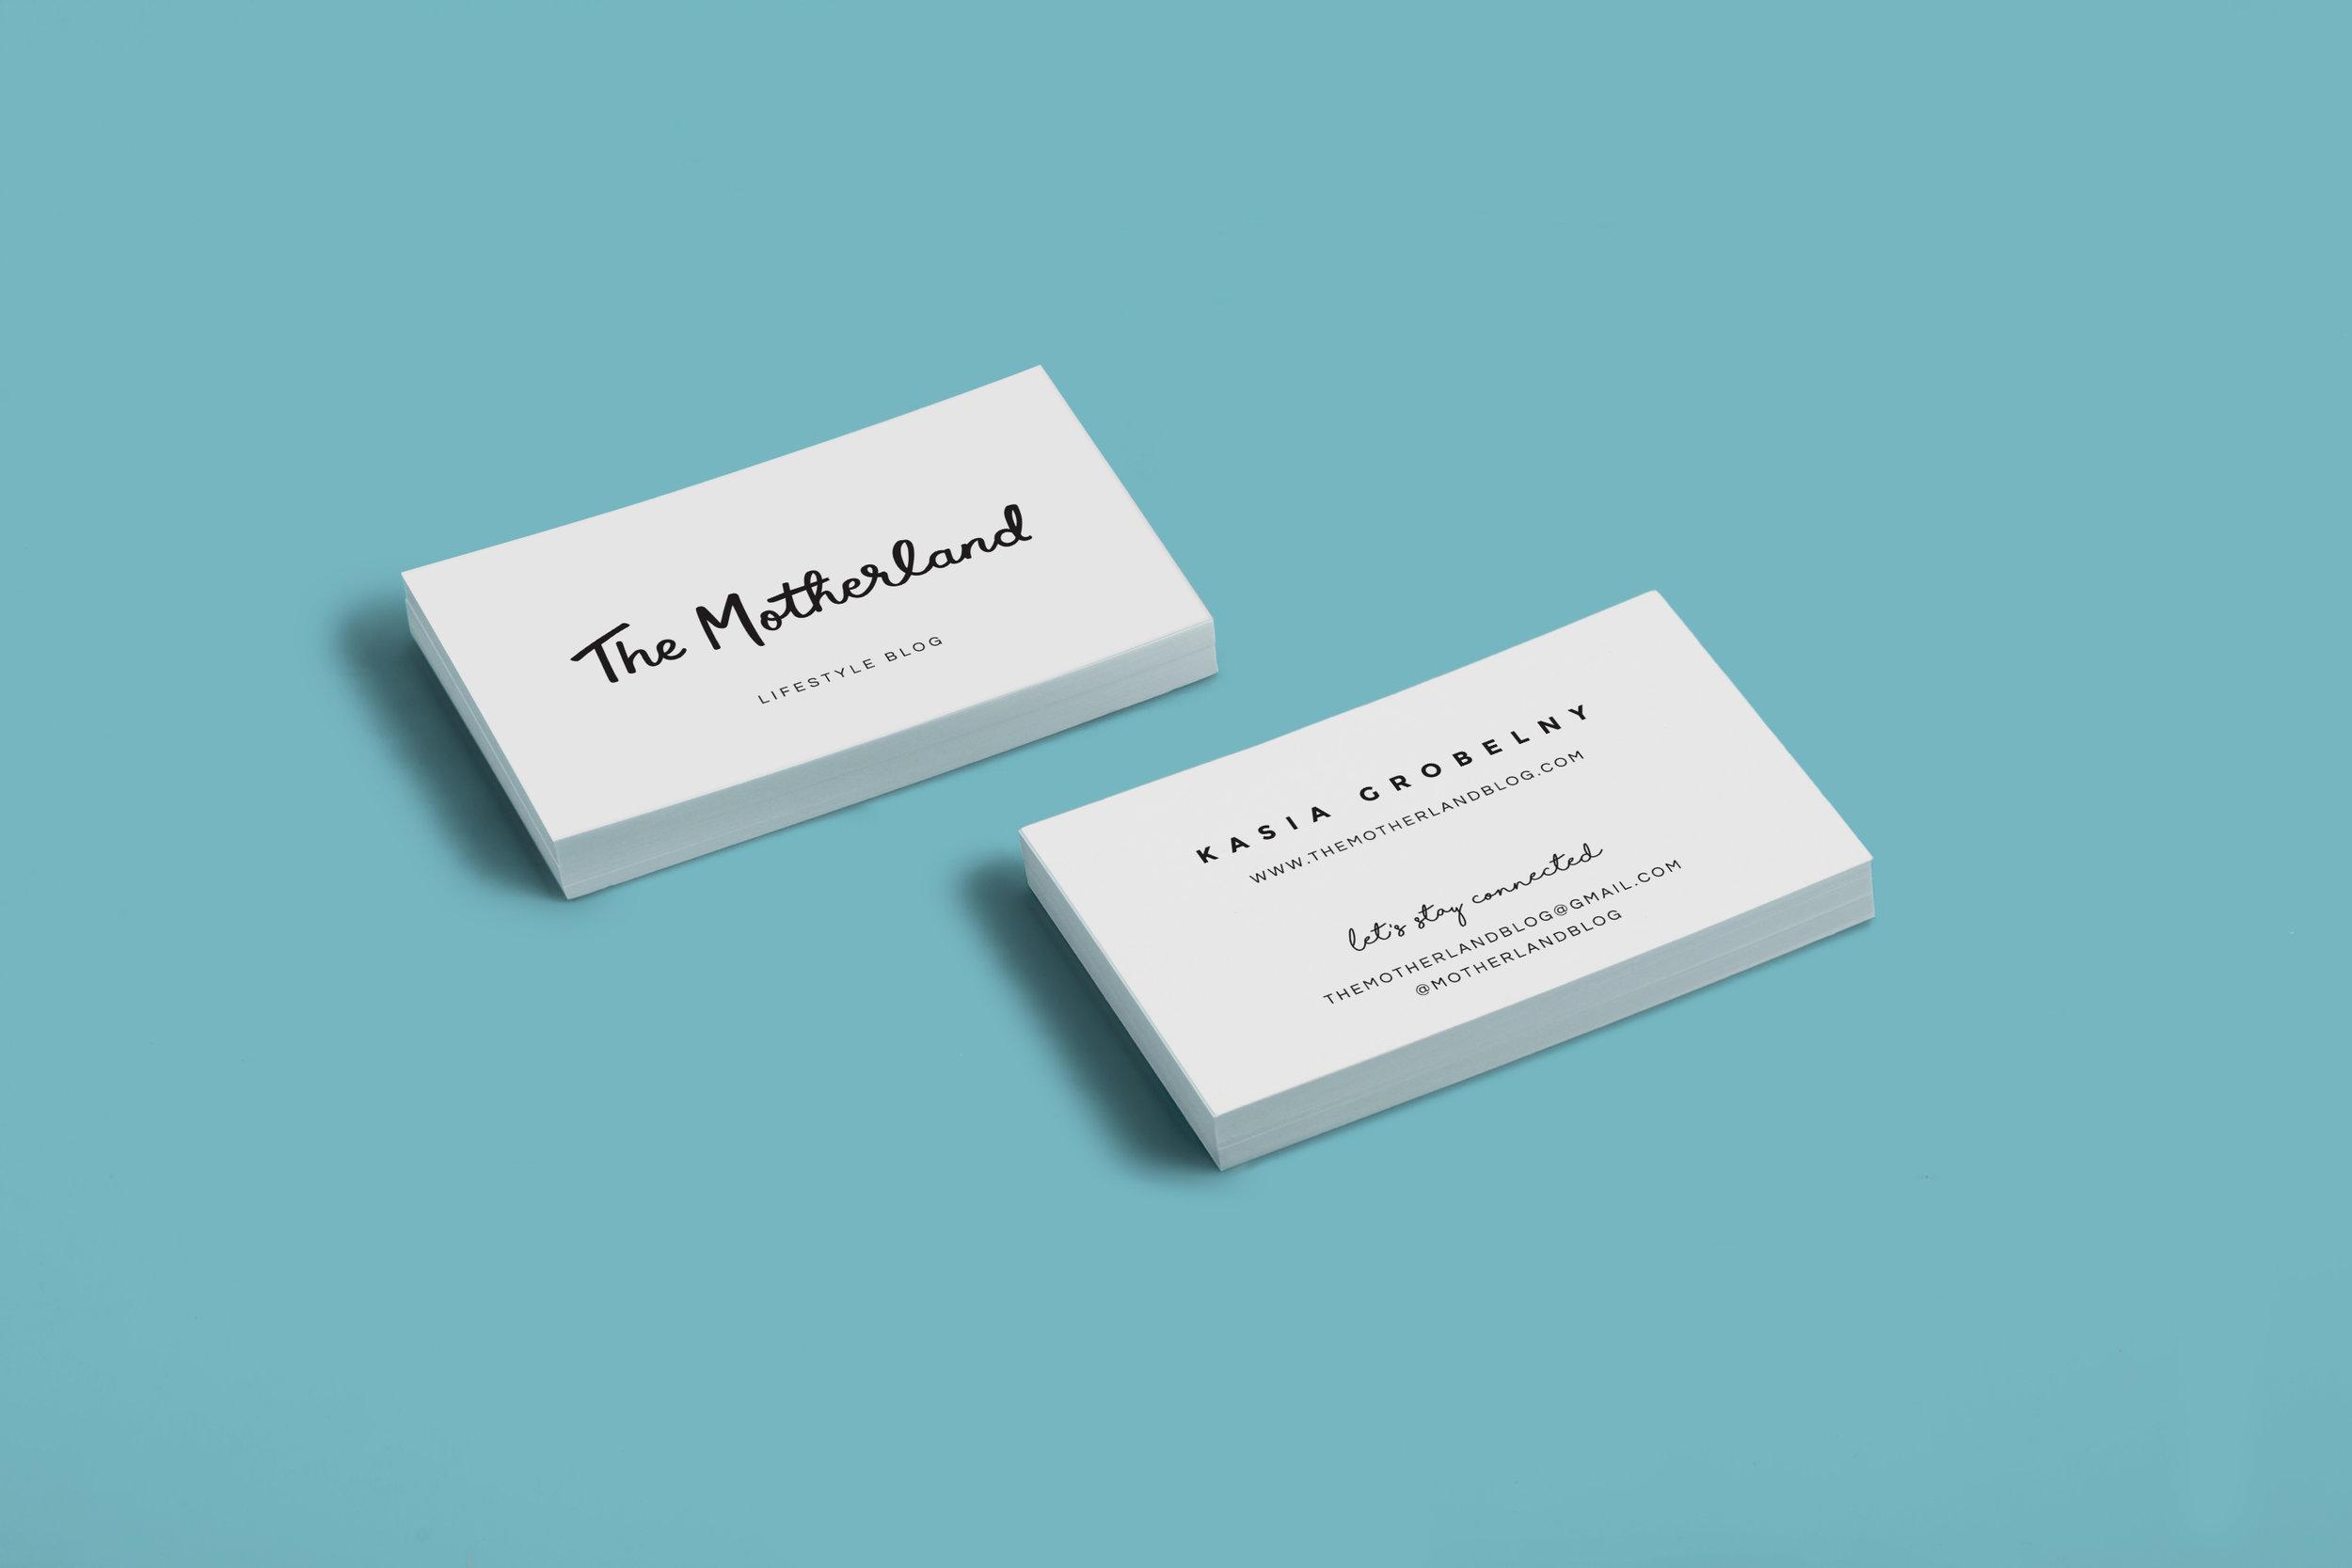 Finka_Studio_The_Motherland_Business_Cards.jpg